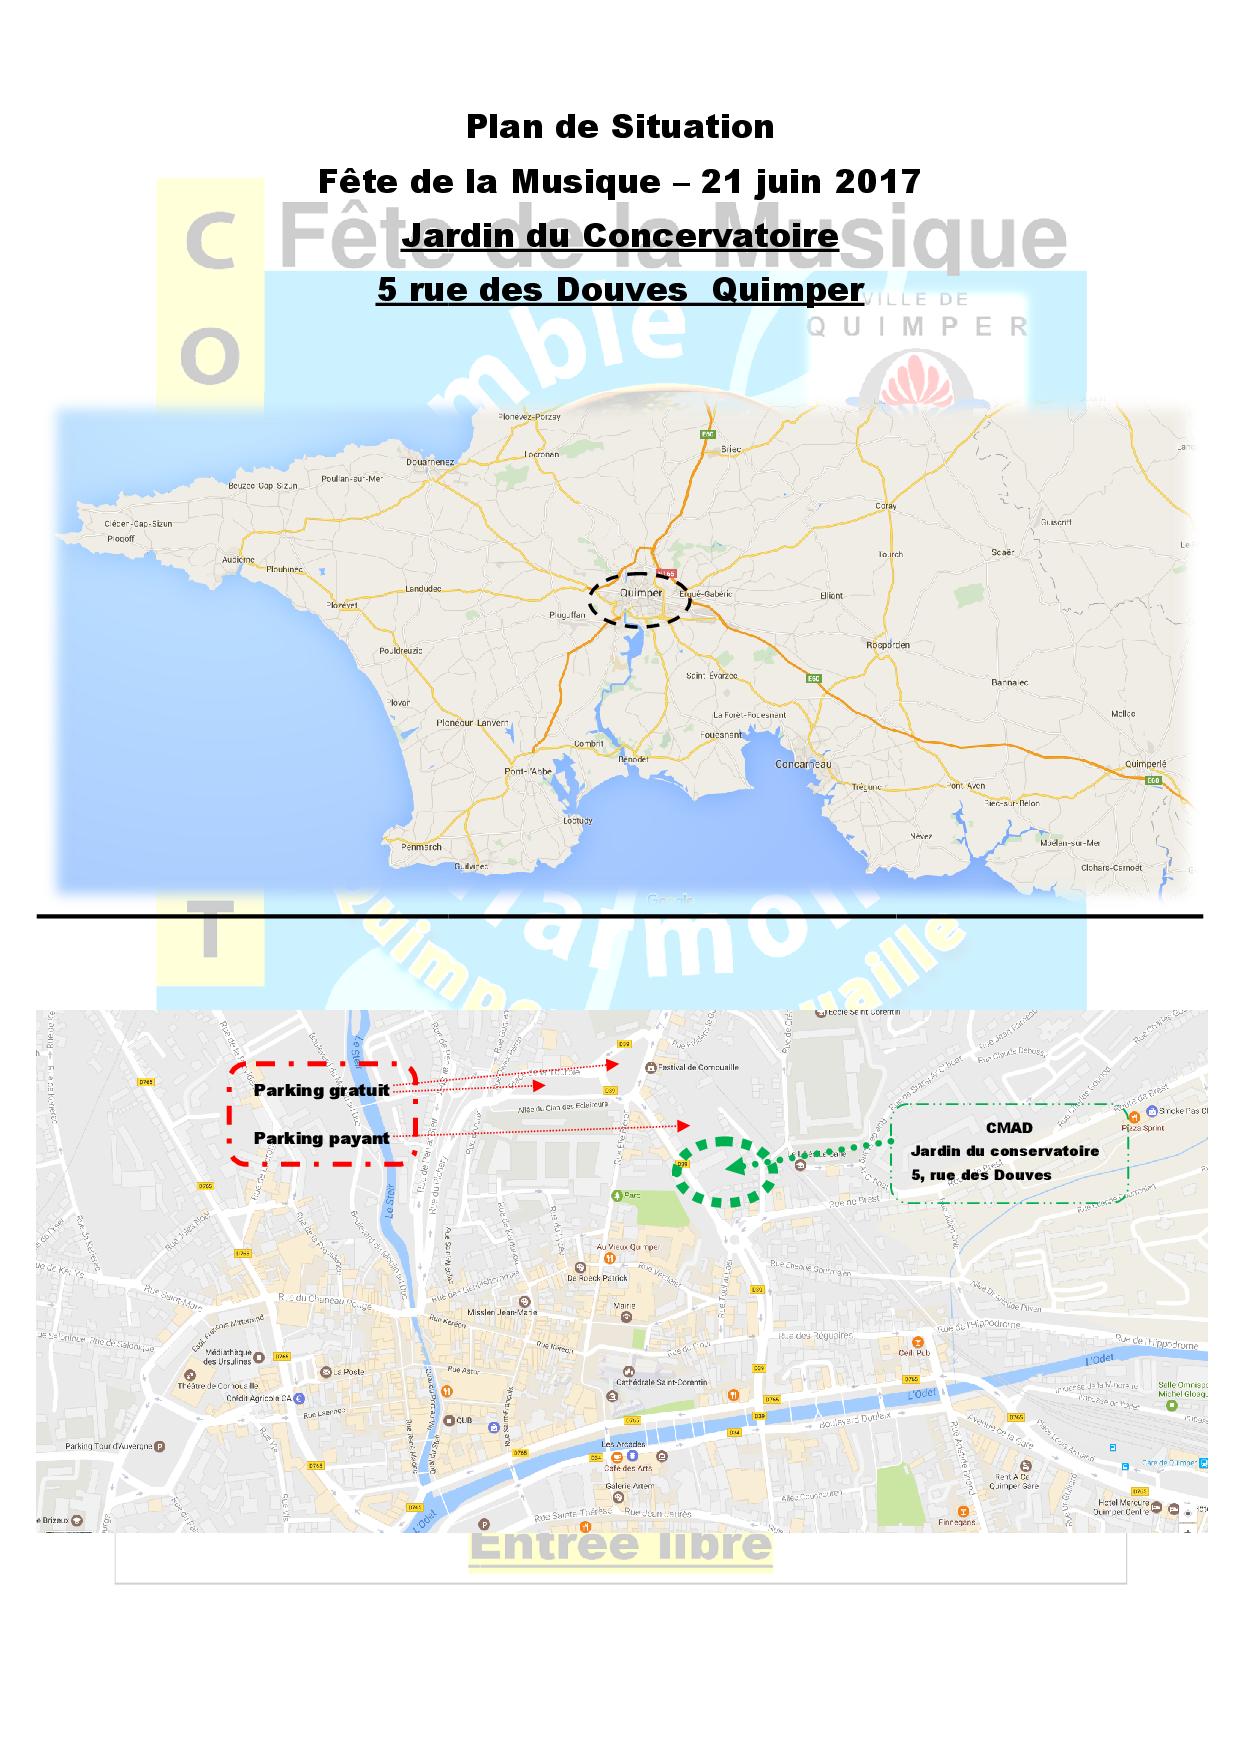 Plan situation cmad rue des douves quimper 210617.png